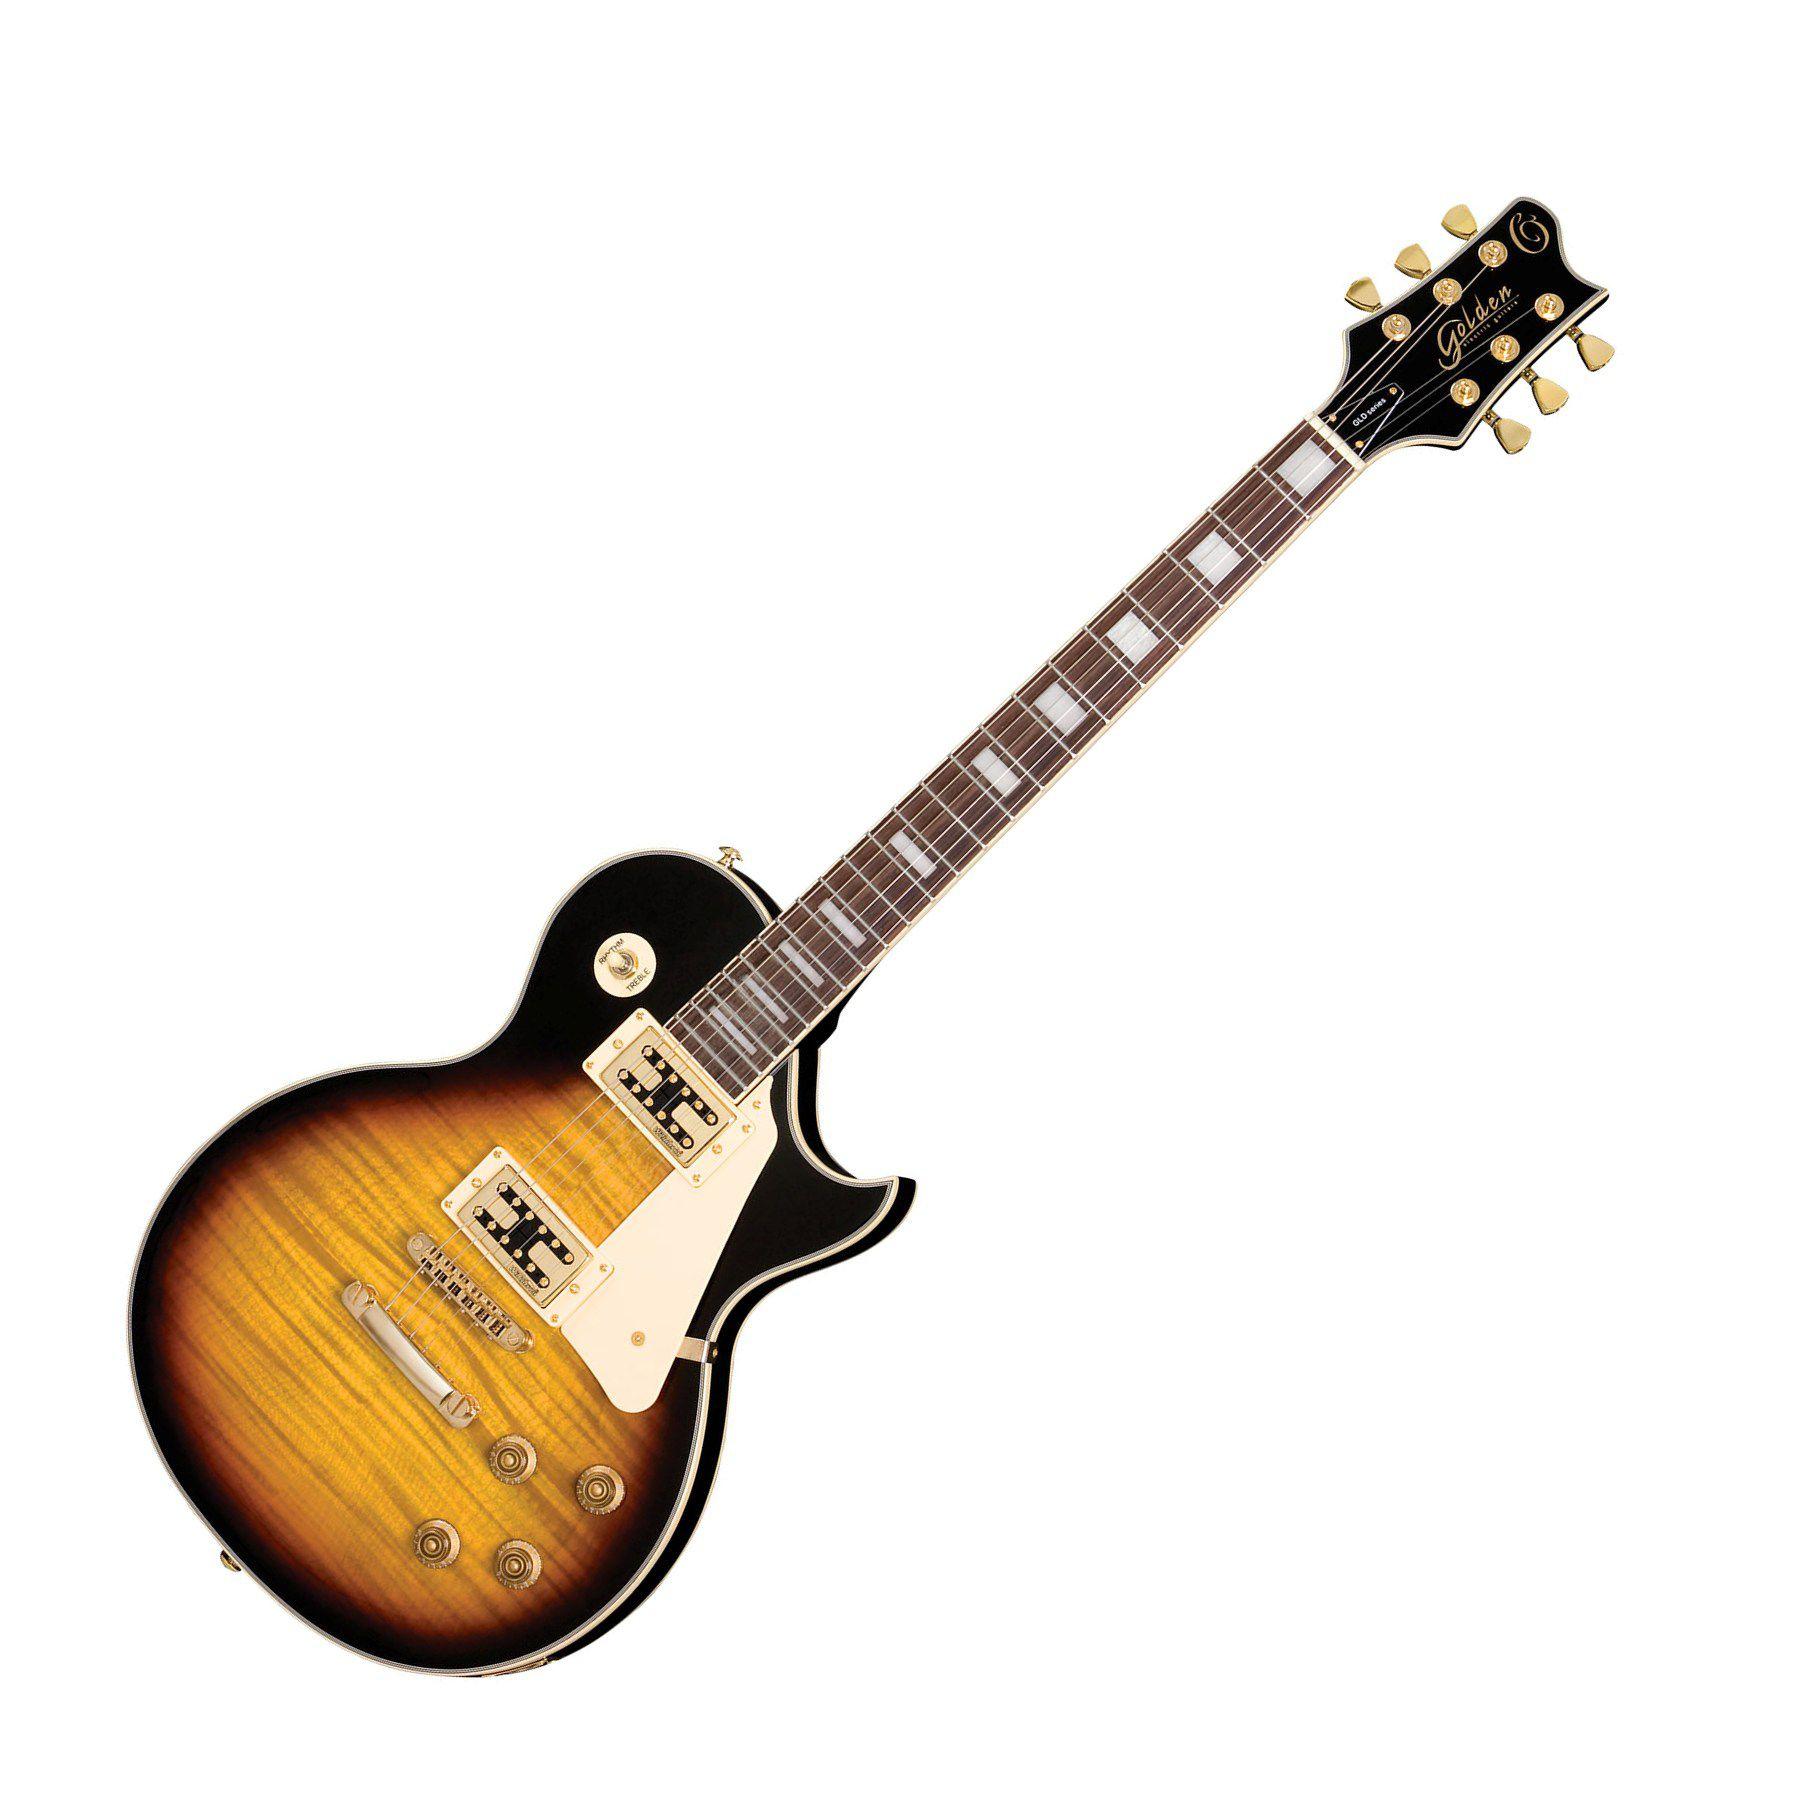 Guitarra Golden Gld155c Brb Lespaul Capitador  Wilkinson Sumburst